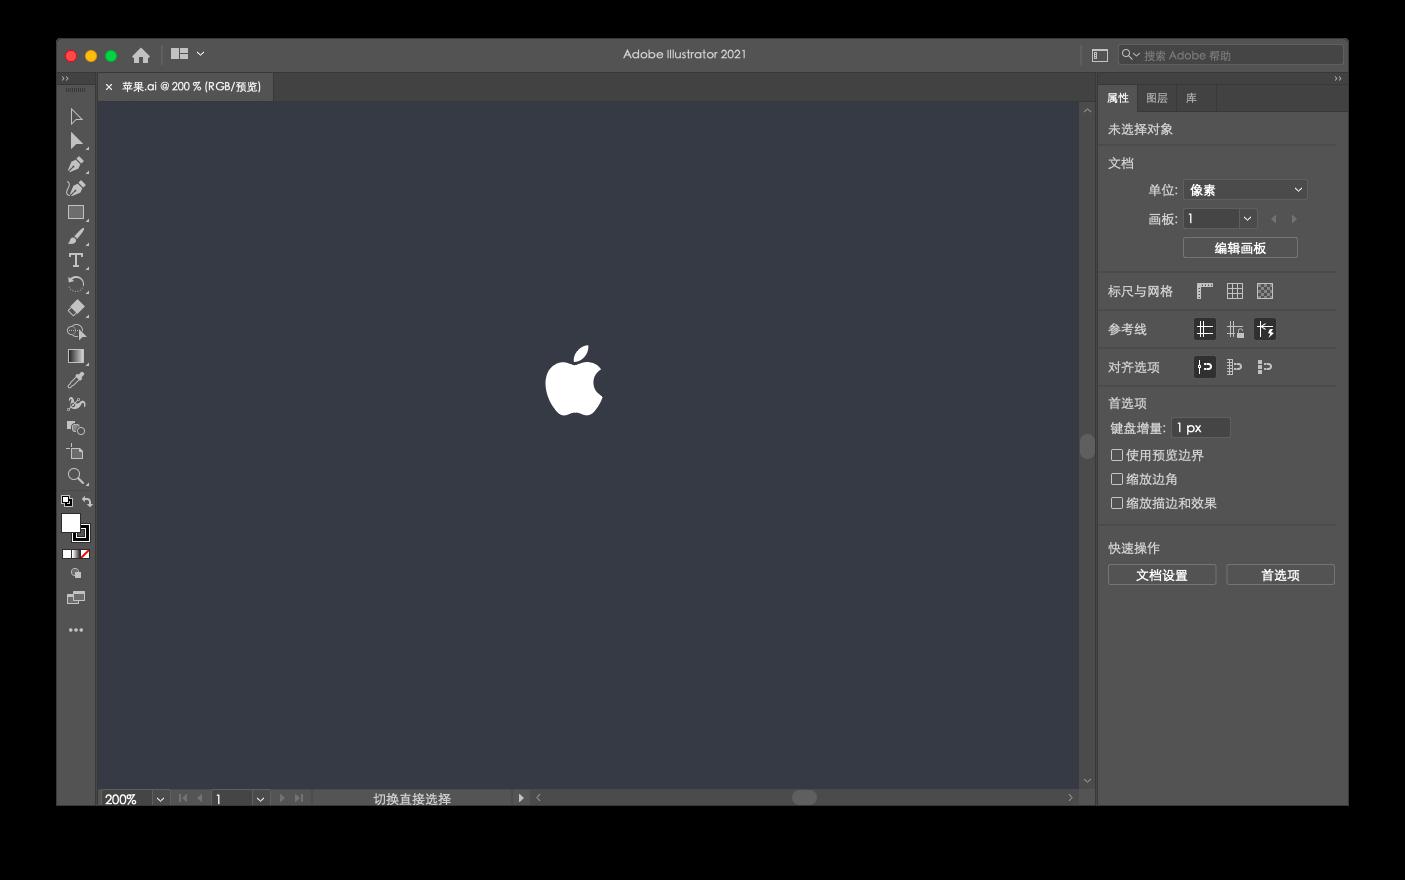 Adobe Illustrator For Mac - 作品 - 苹果标志